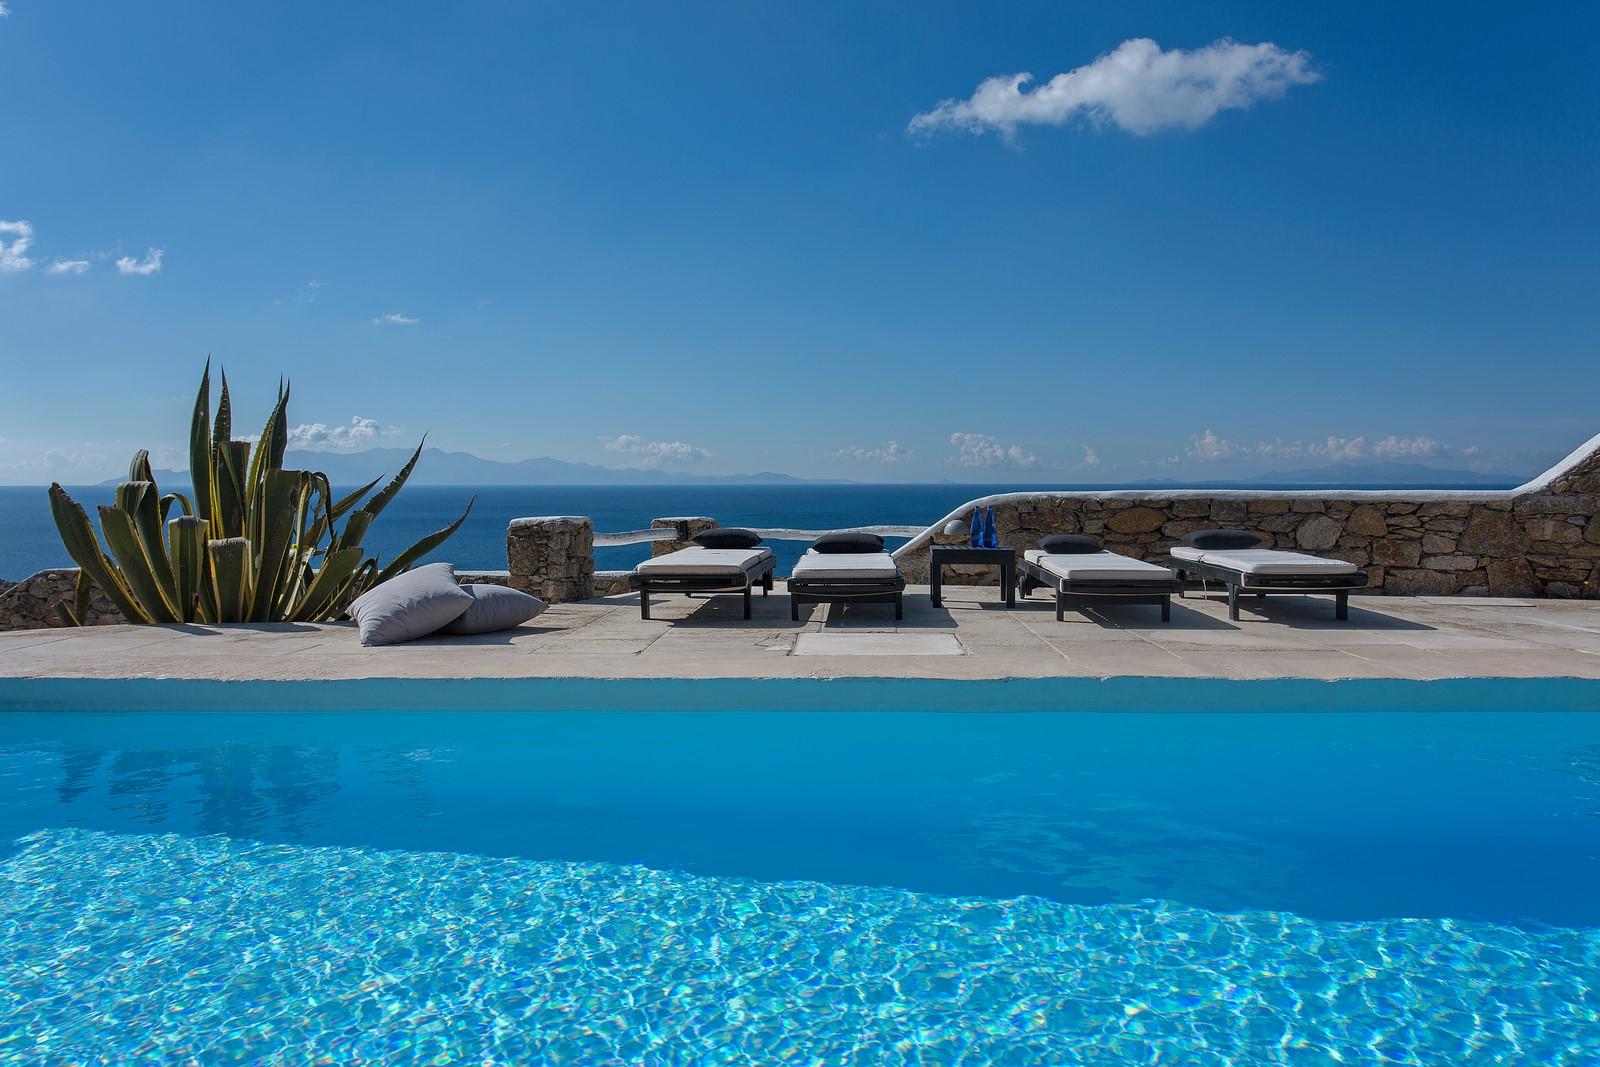 Villa Carina III, stylish and l;luxurious villa with amazing sea view by Elite Estates.